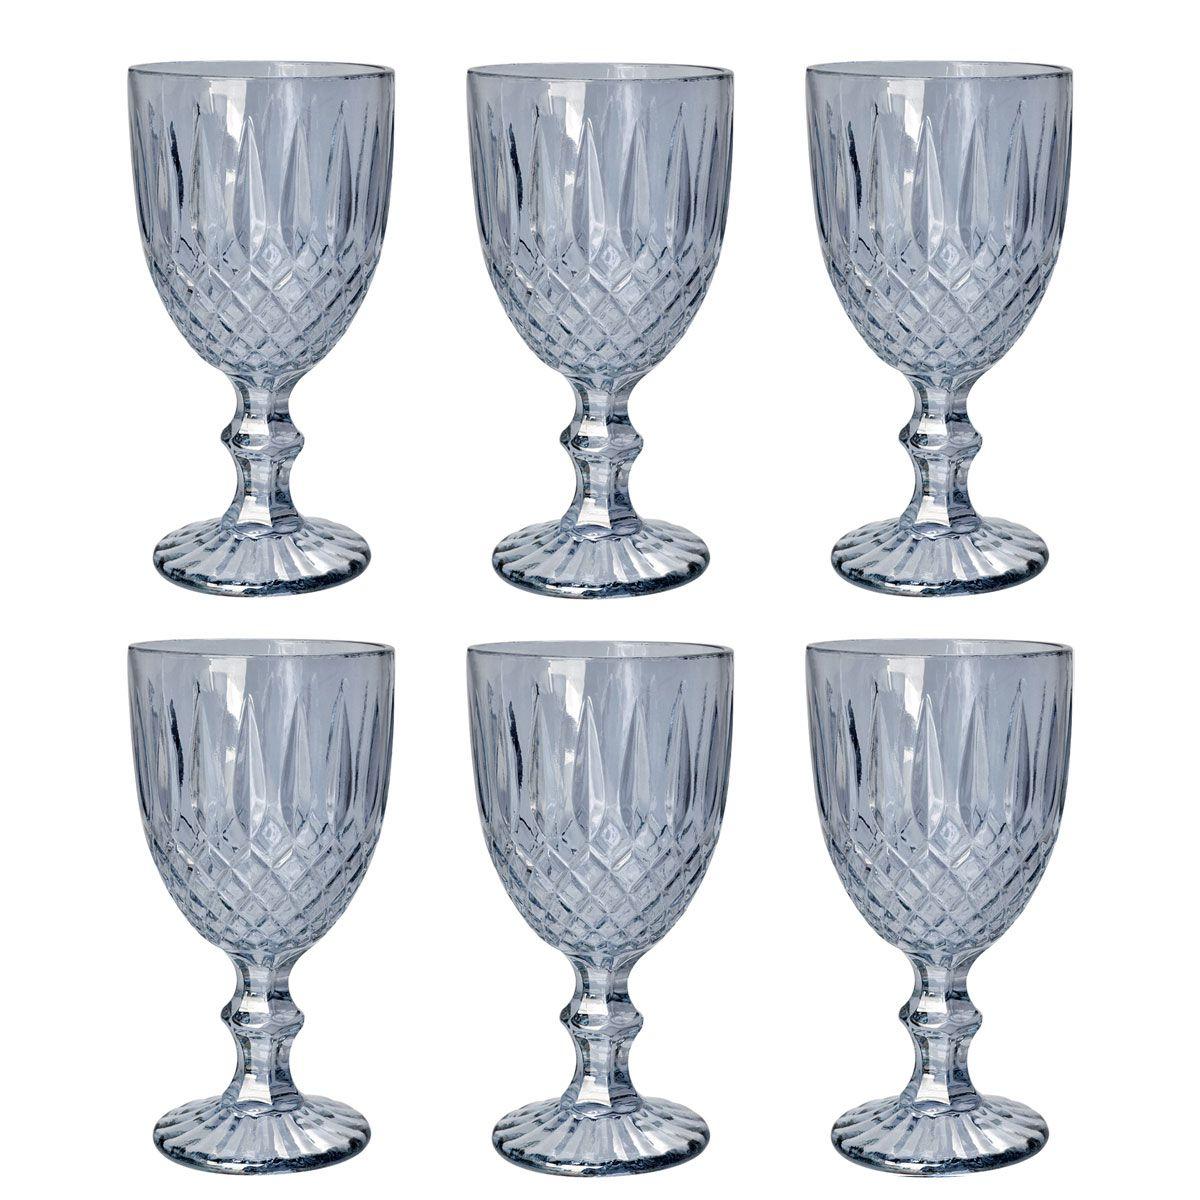 Jogo 6 taças 220ml para água de vidro cinza Greek Bon Gourmet - 35454